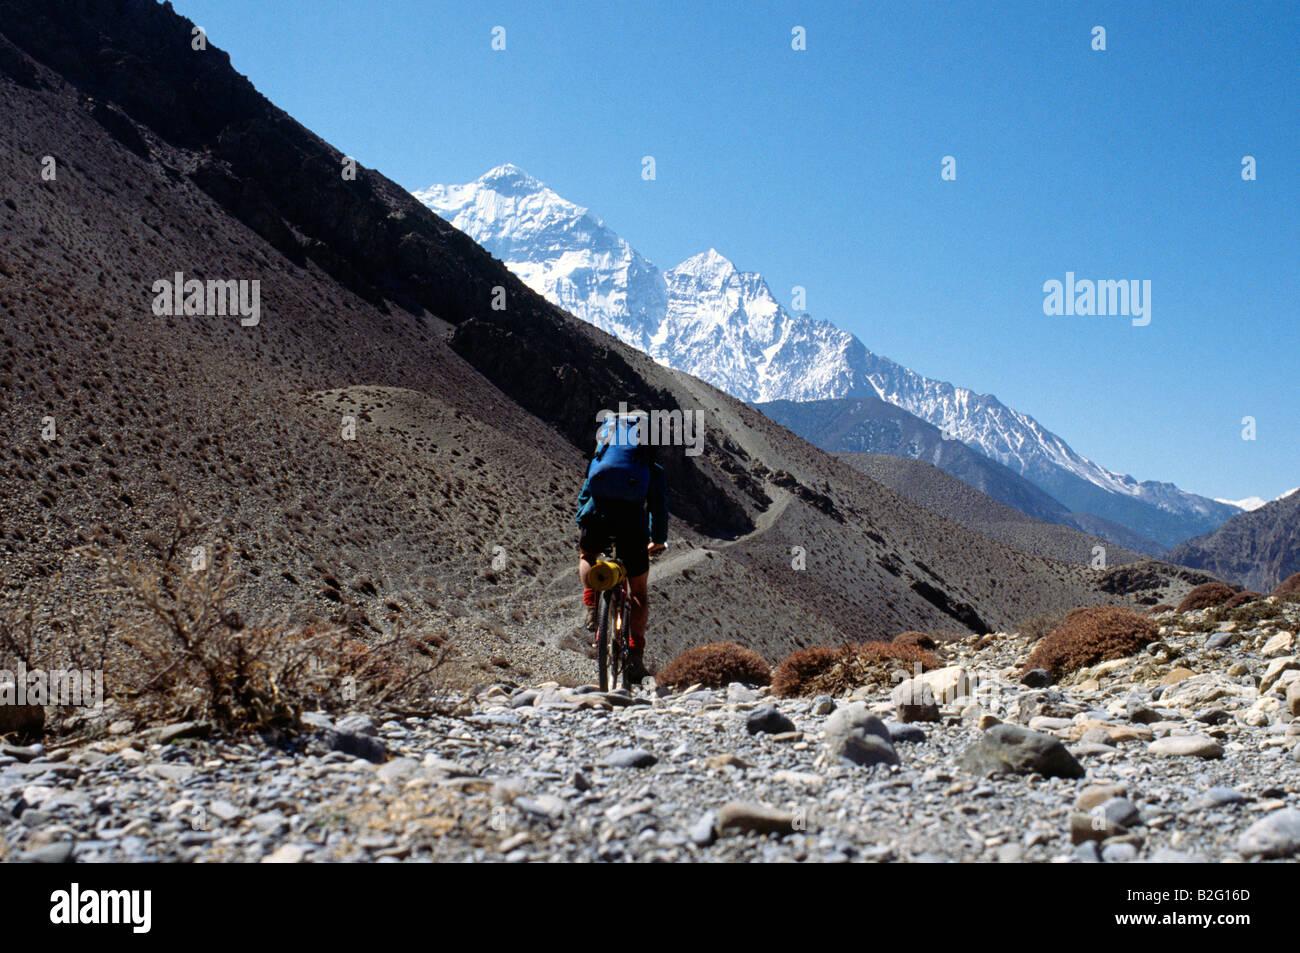 Doug Blane mountain biking around the Annapurna circuit in Himalayan Kingdom of Nepal Nepalese Himalayas - Stock Image